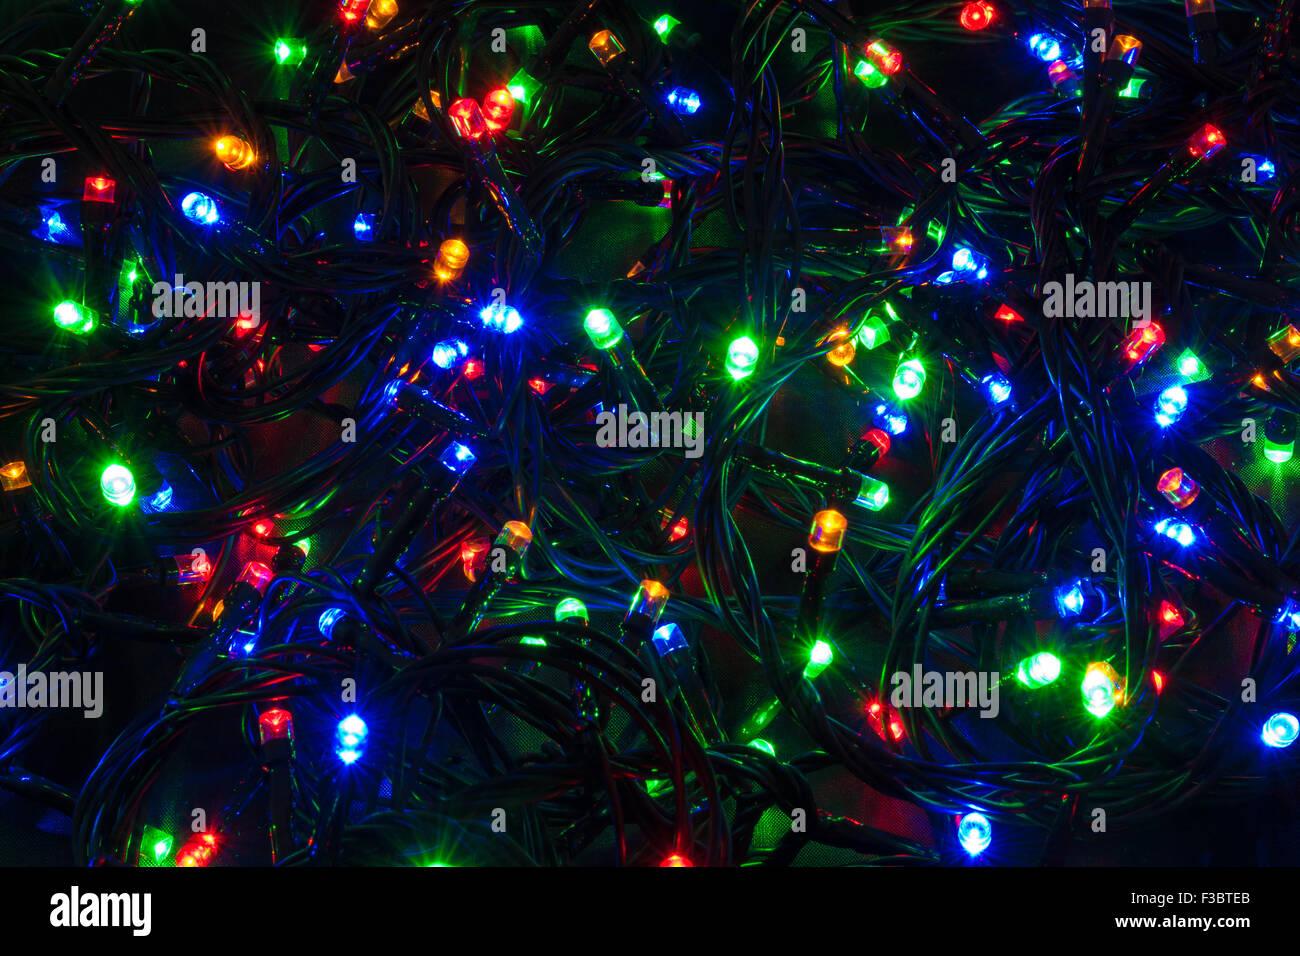 illuminated closeup of tangled christmas lights stock image - Tangled Christmas Lights